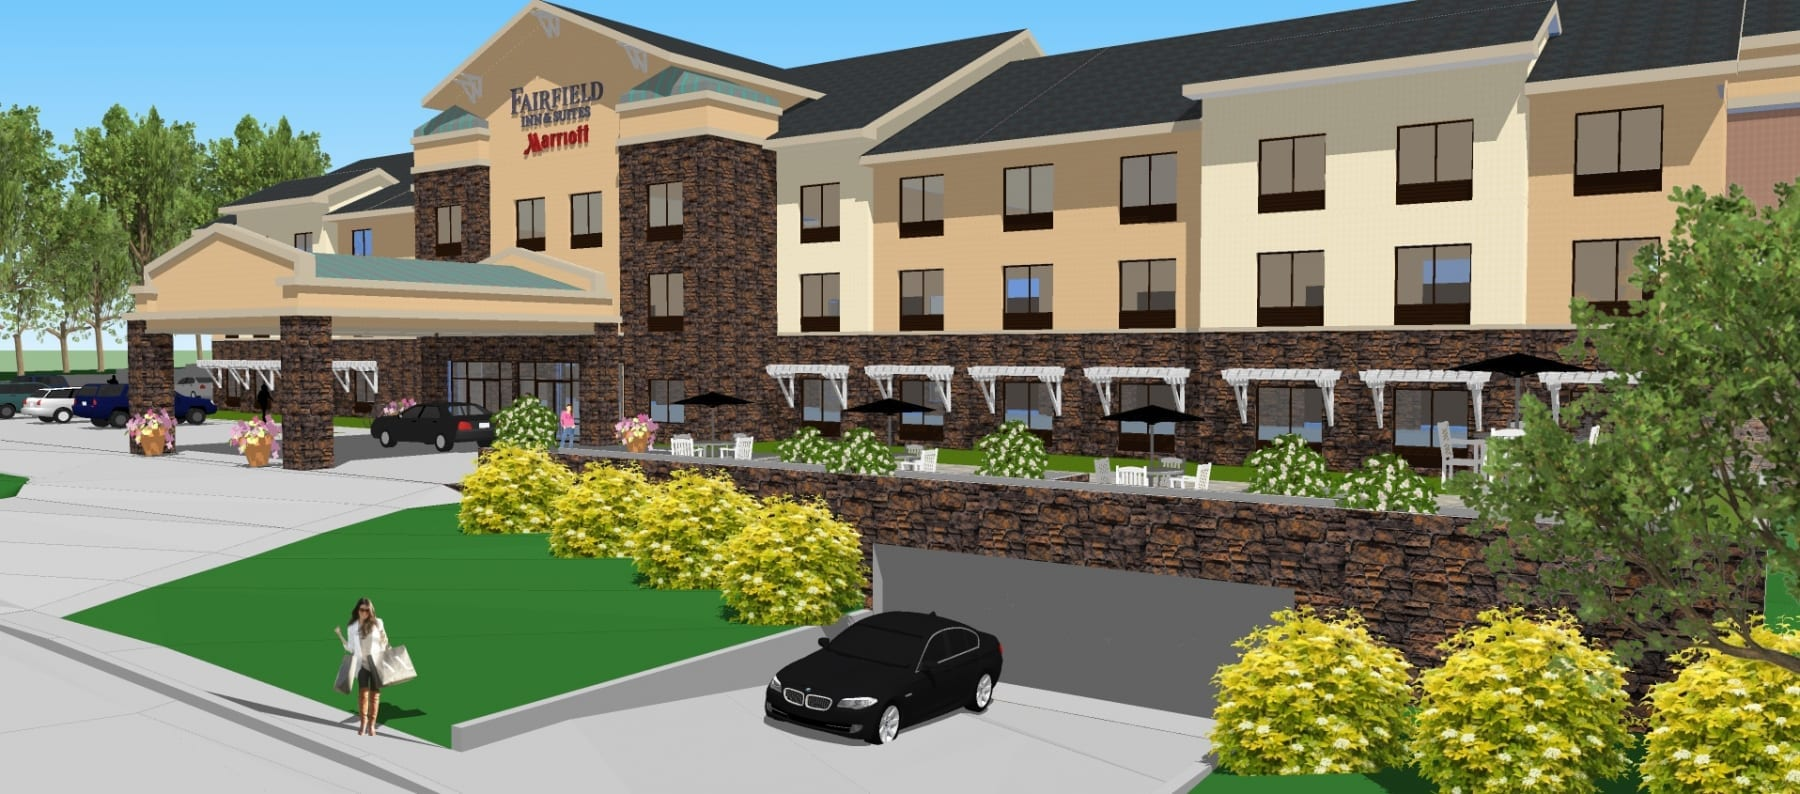 Marriott Fairfield Inn & Suites in Santa Cruz designed by top hotel architect